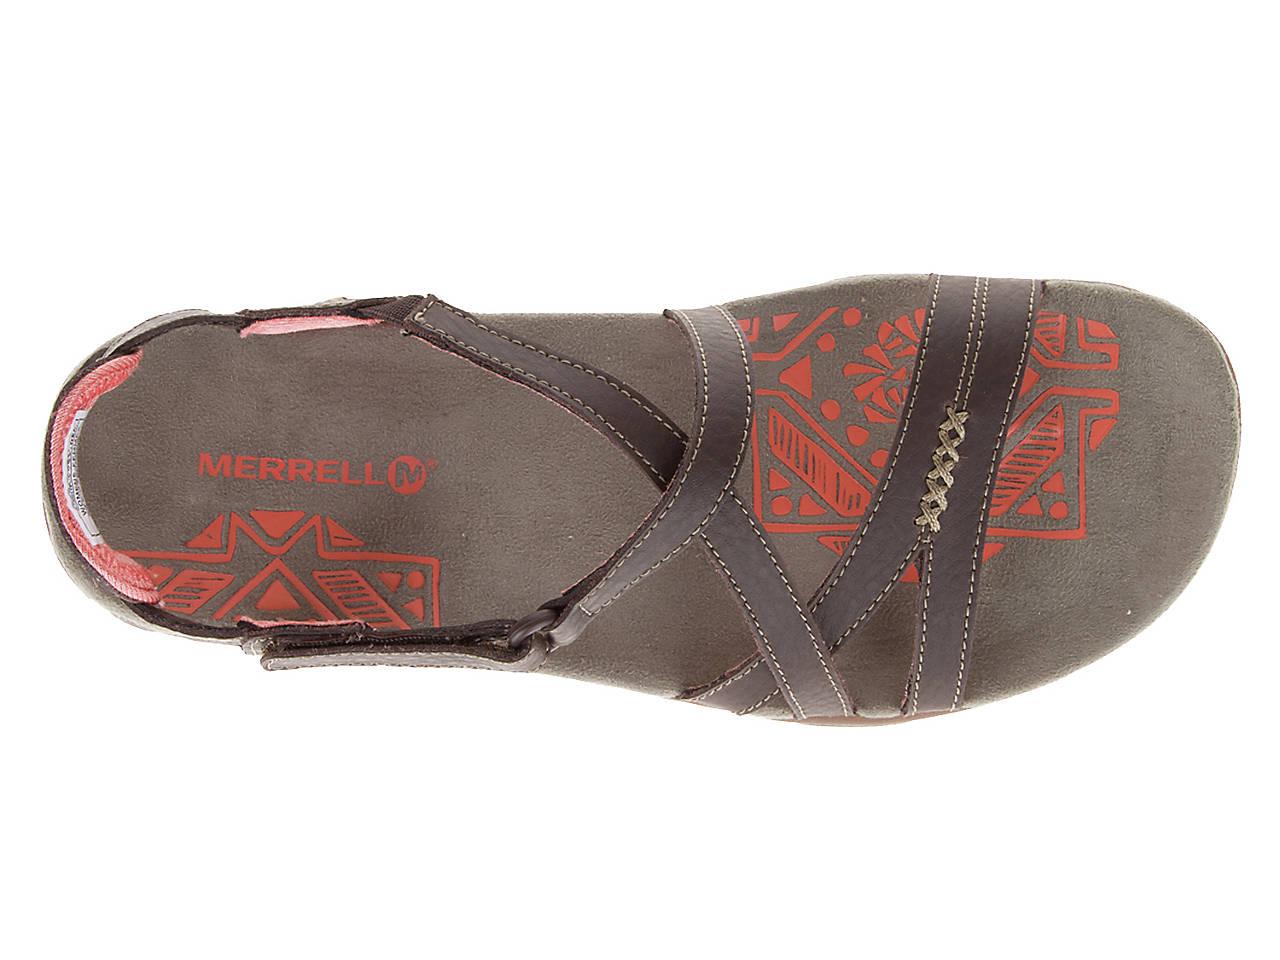 41be472870a11 Merrell Sandspur Rose Sandal Women s Shoes